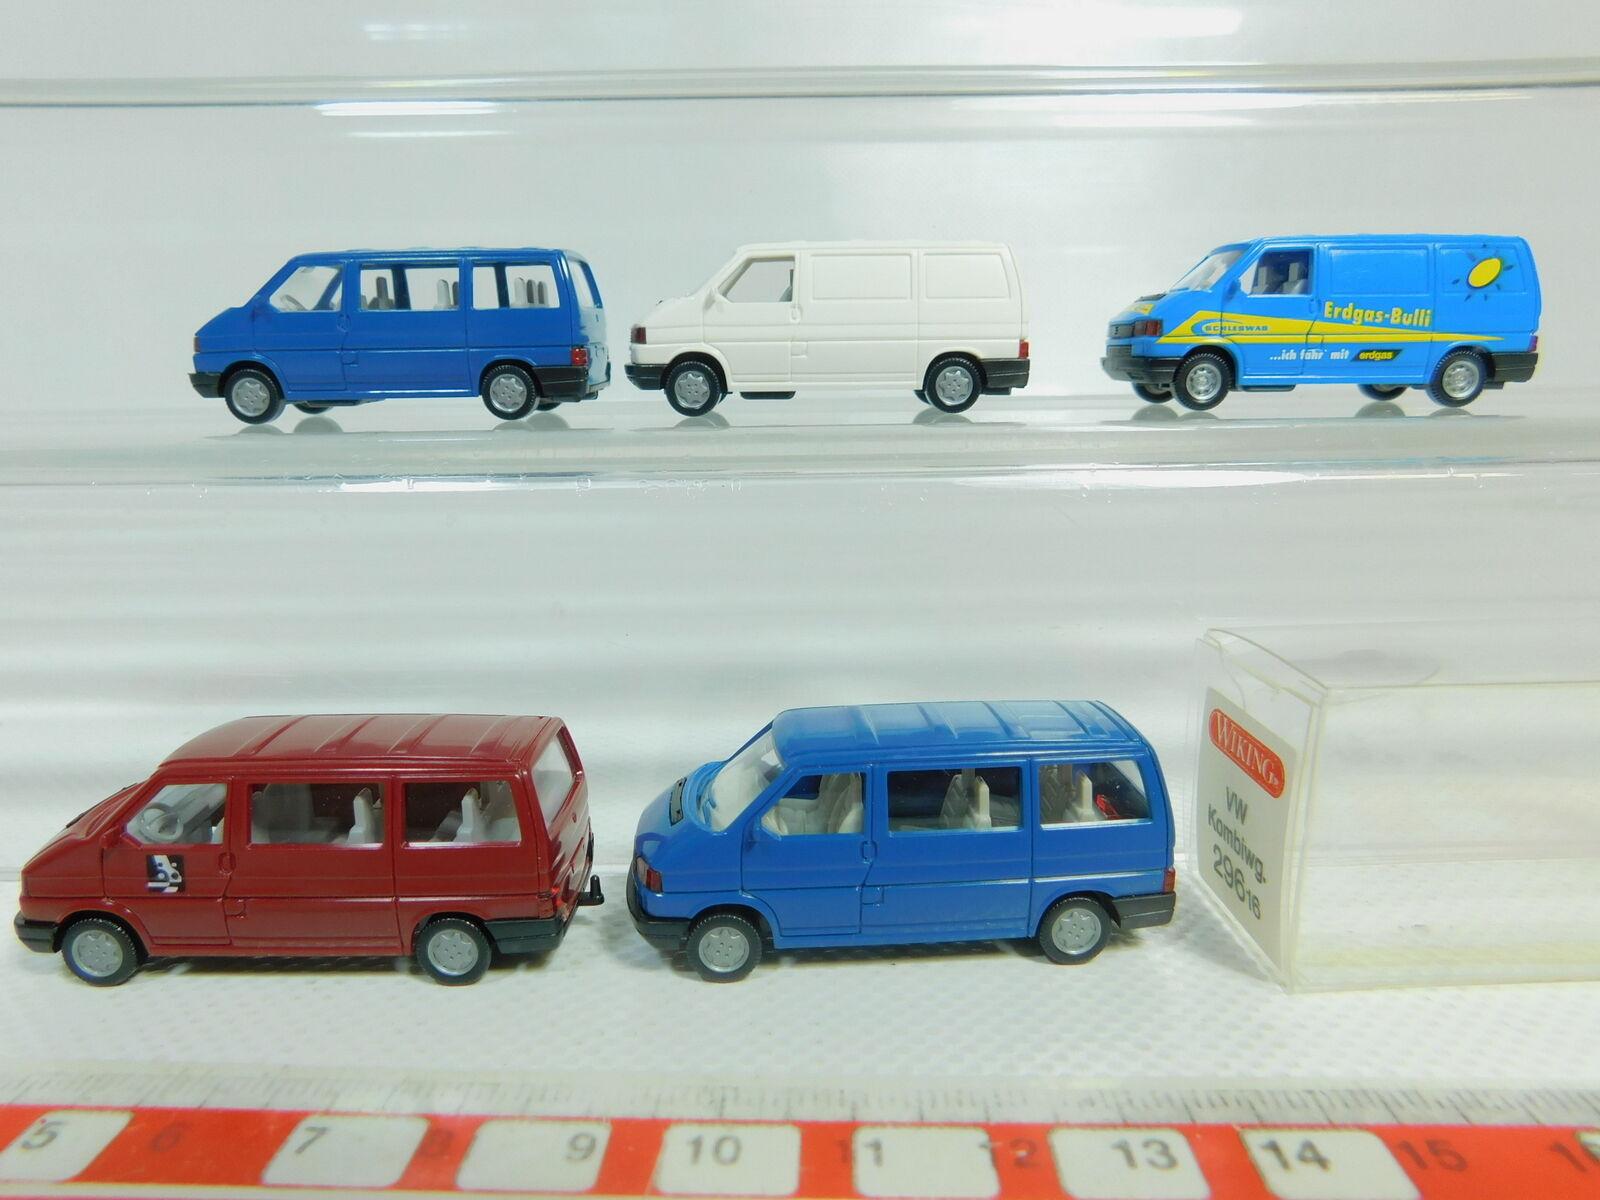 BO569-0,5x Wiking H0 1 1 1 87 Volkswagen T4  Erdgas-Bulli+296 etc sehr gut+1x OVP 6cb0e9